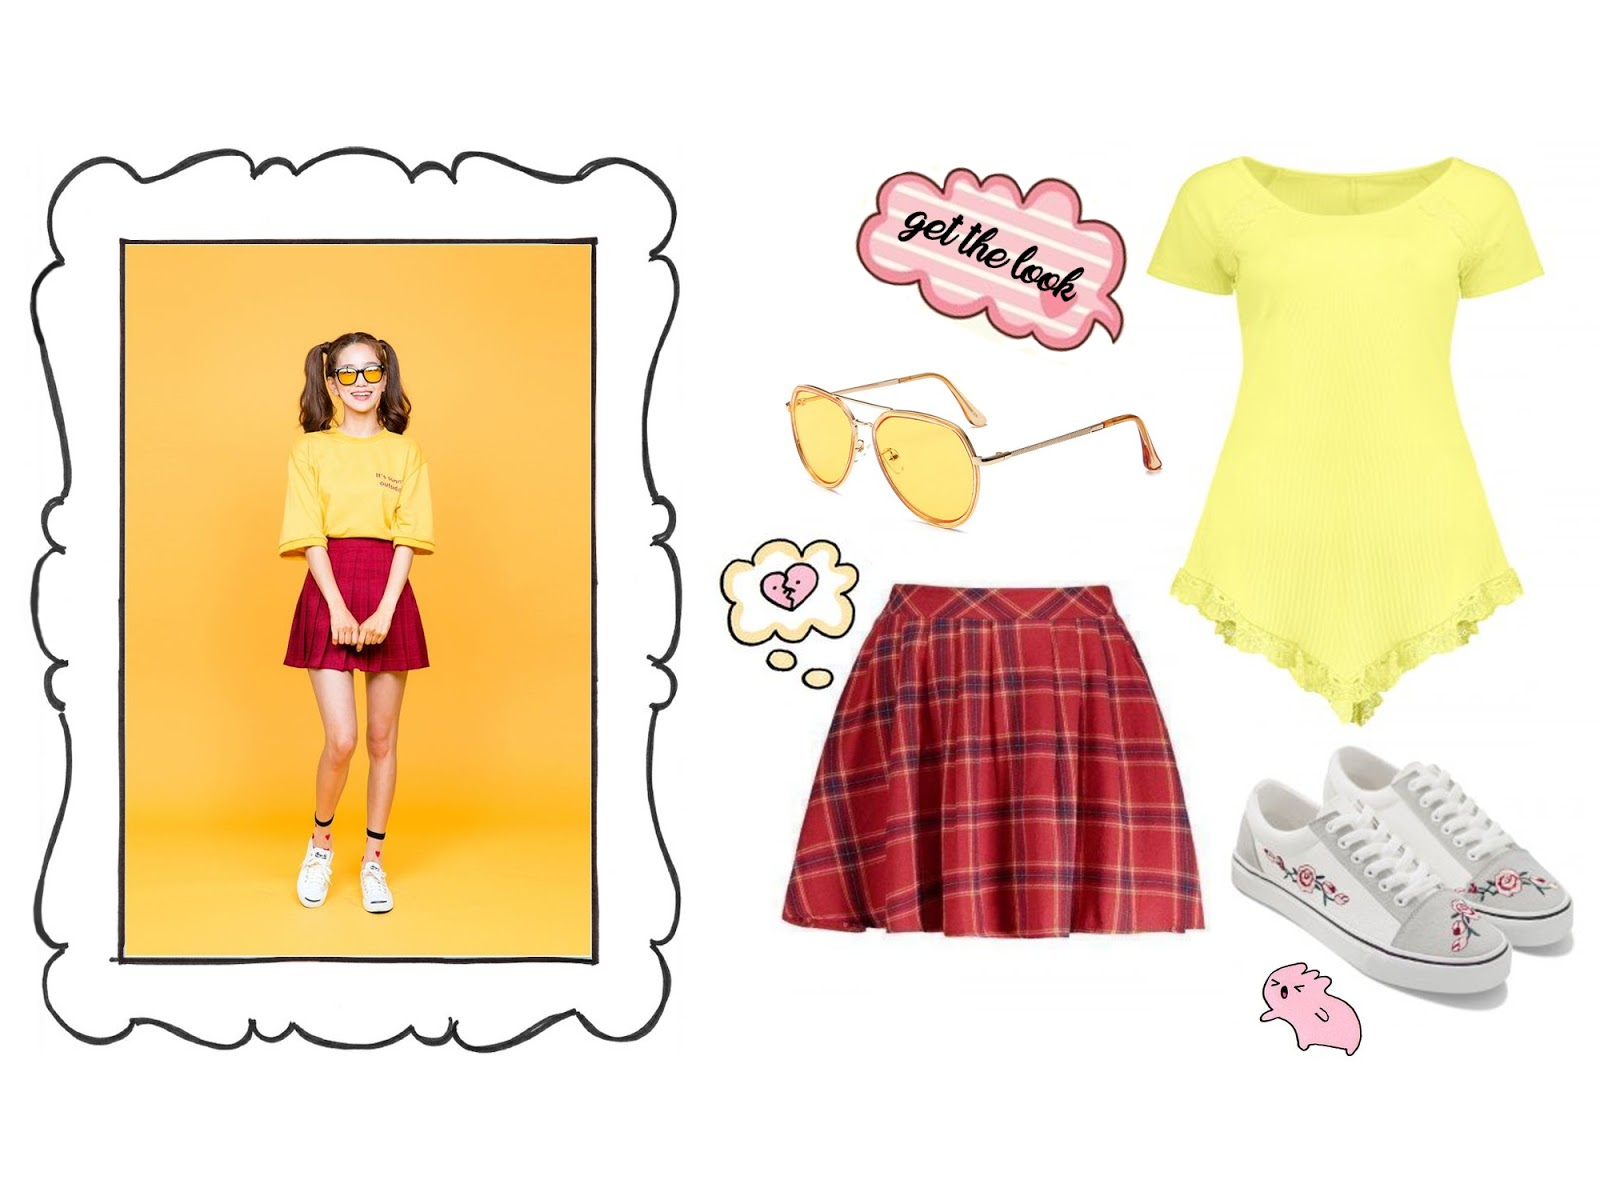 k-fashion collage